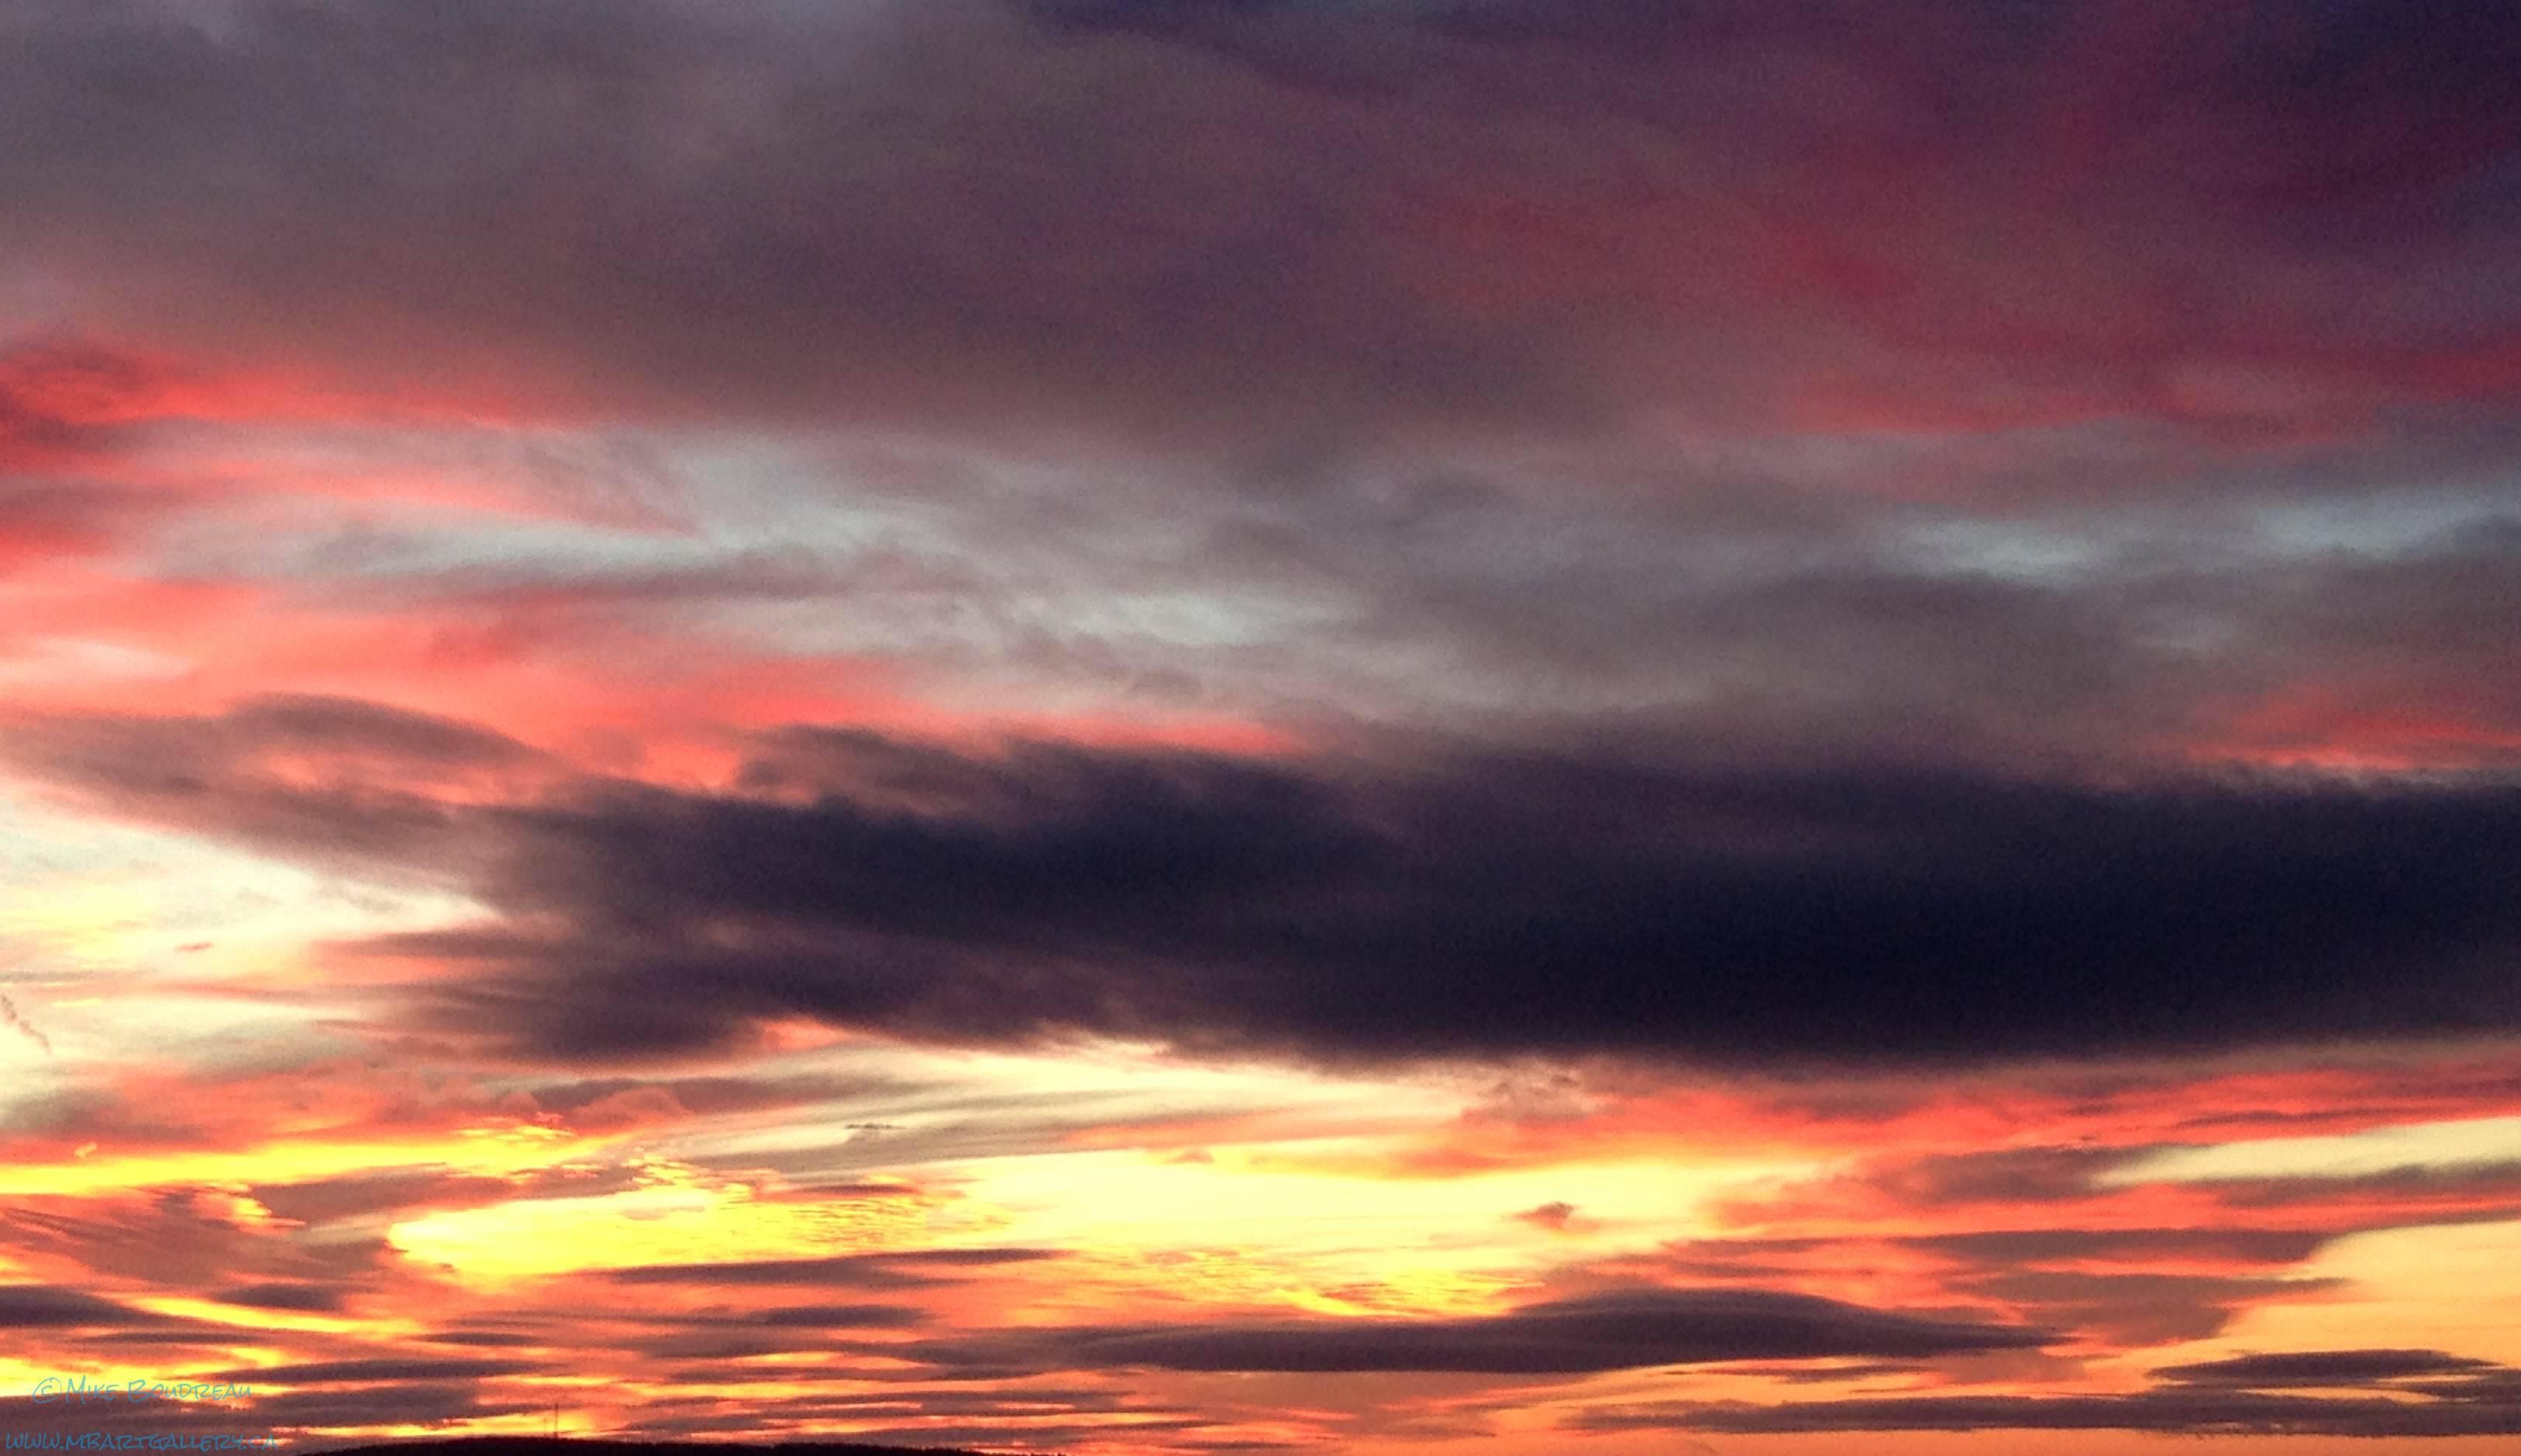 Morning Sky over Bay of Fundy, Saint John NB